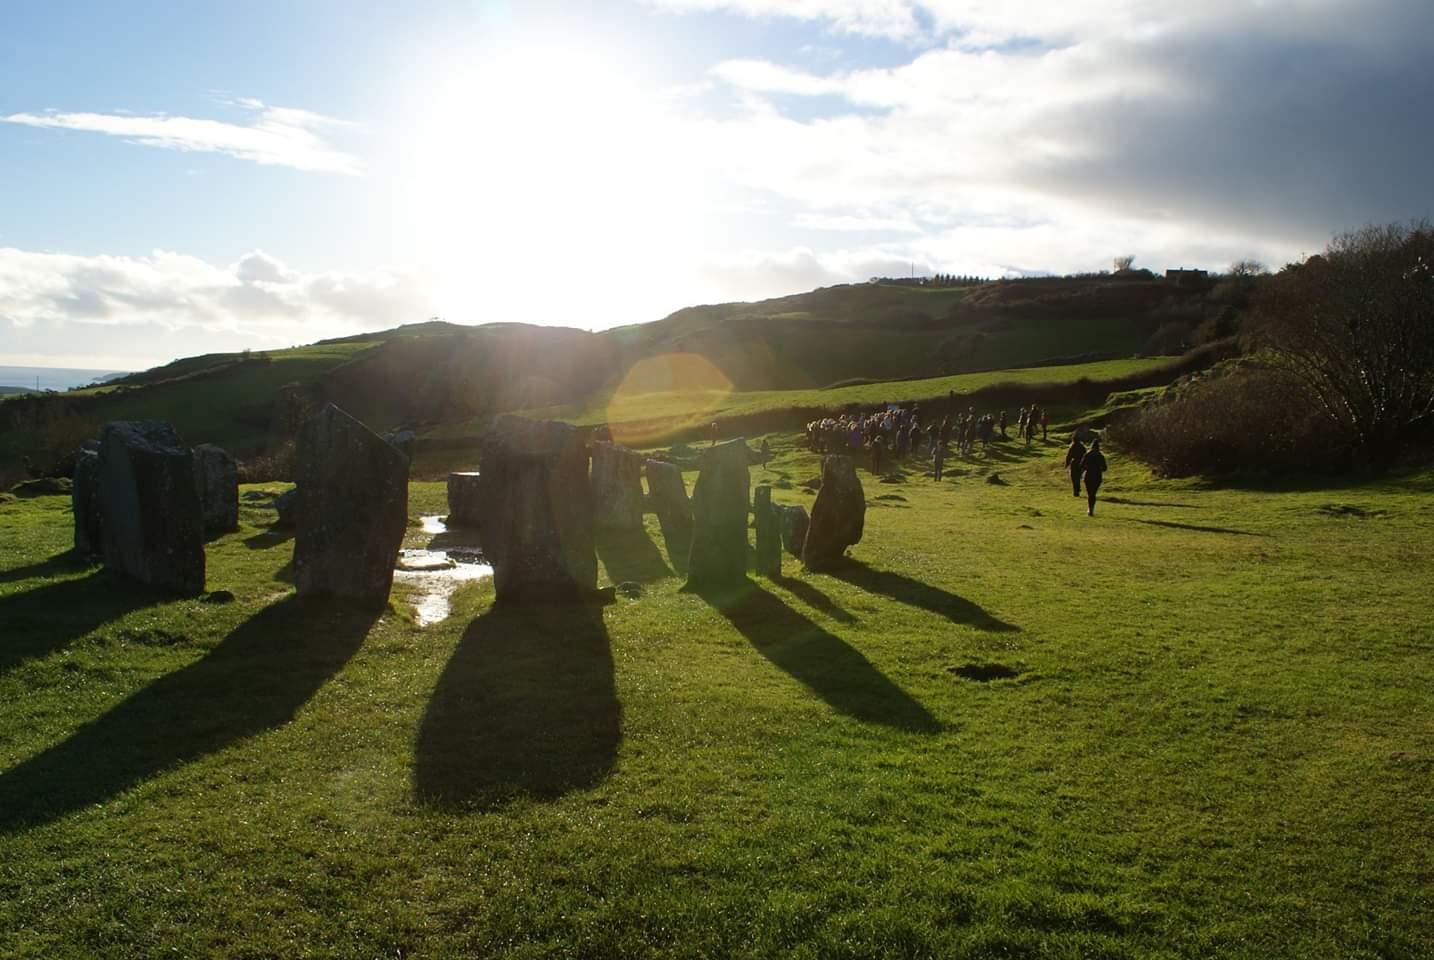 Drombeg Stone Circle in County Cork  Photo provided by Patrick Salerno '21